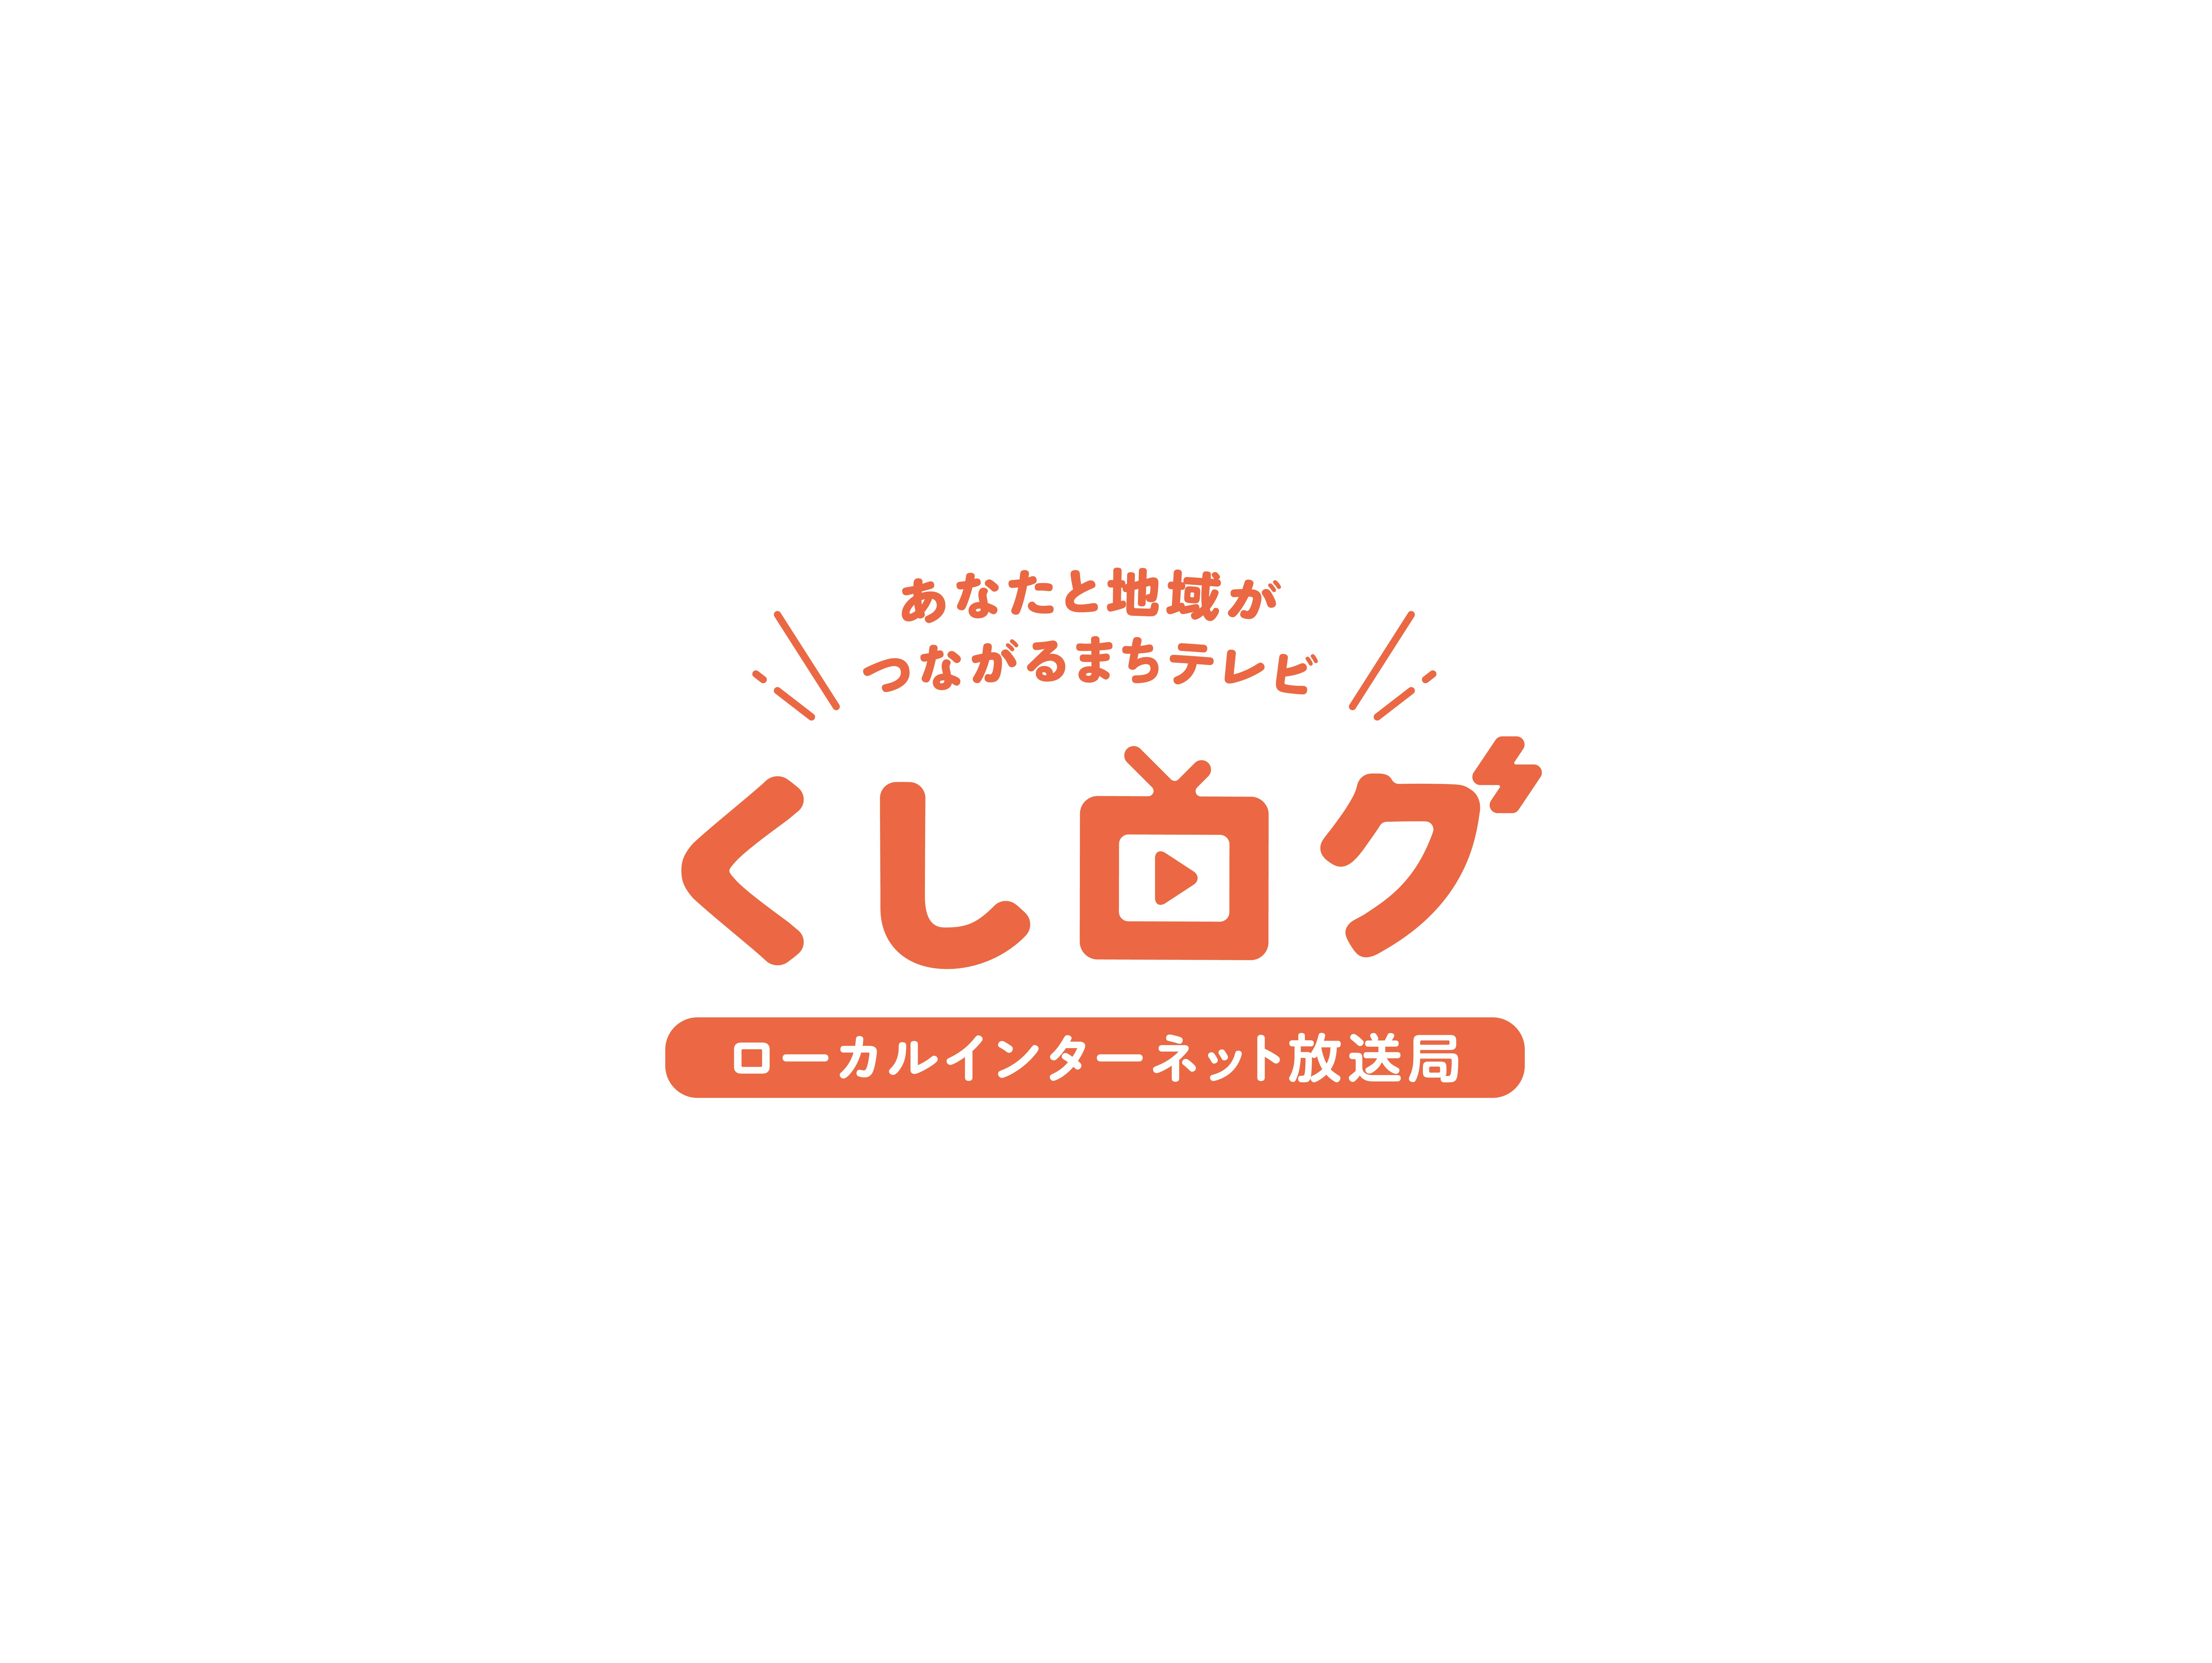 <span>logo</span><br>ローカルインターネット放送局<br>くしログ